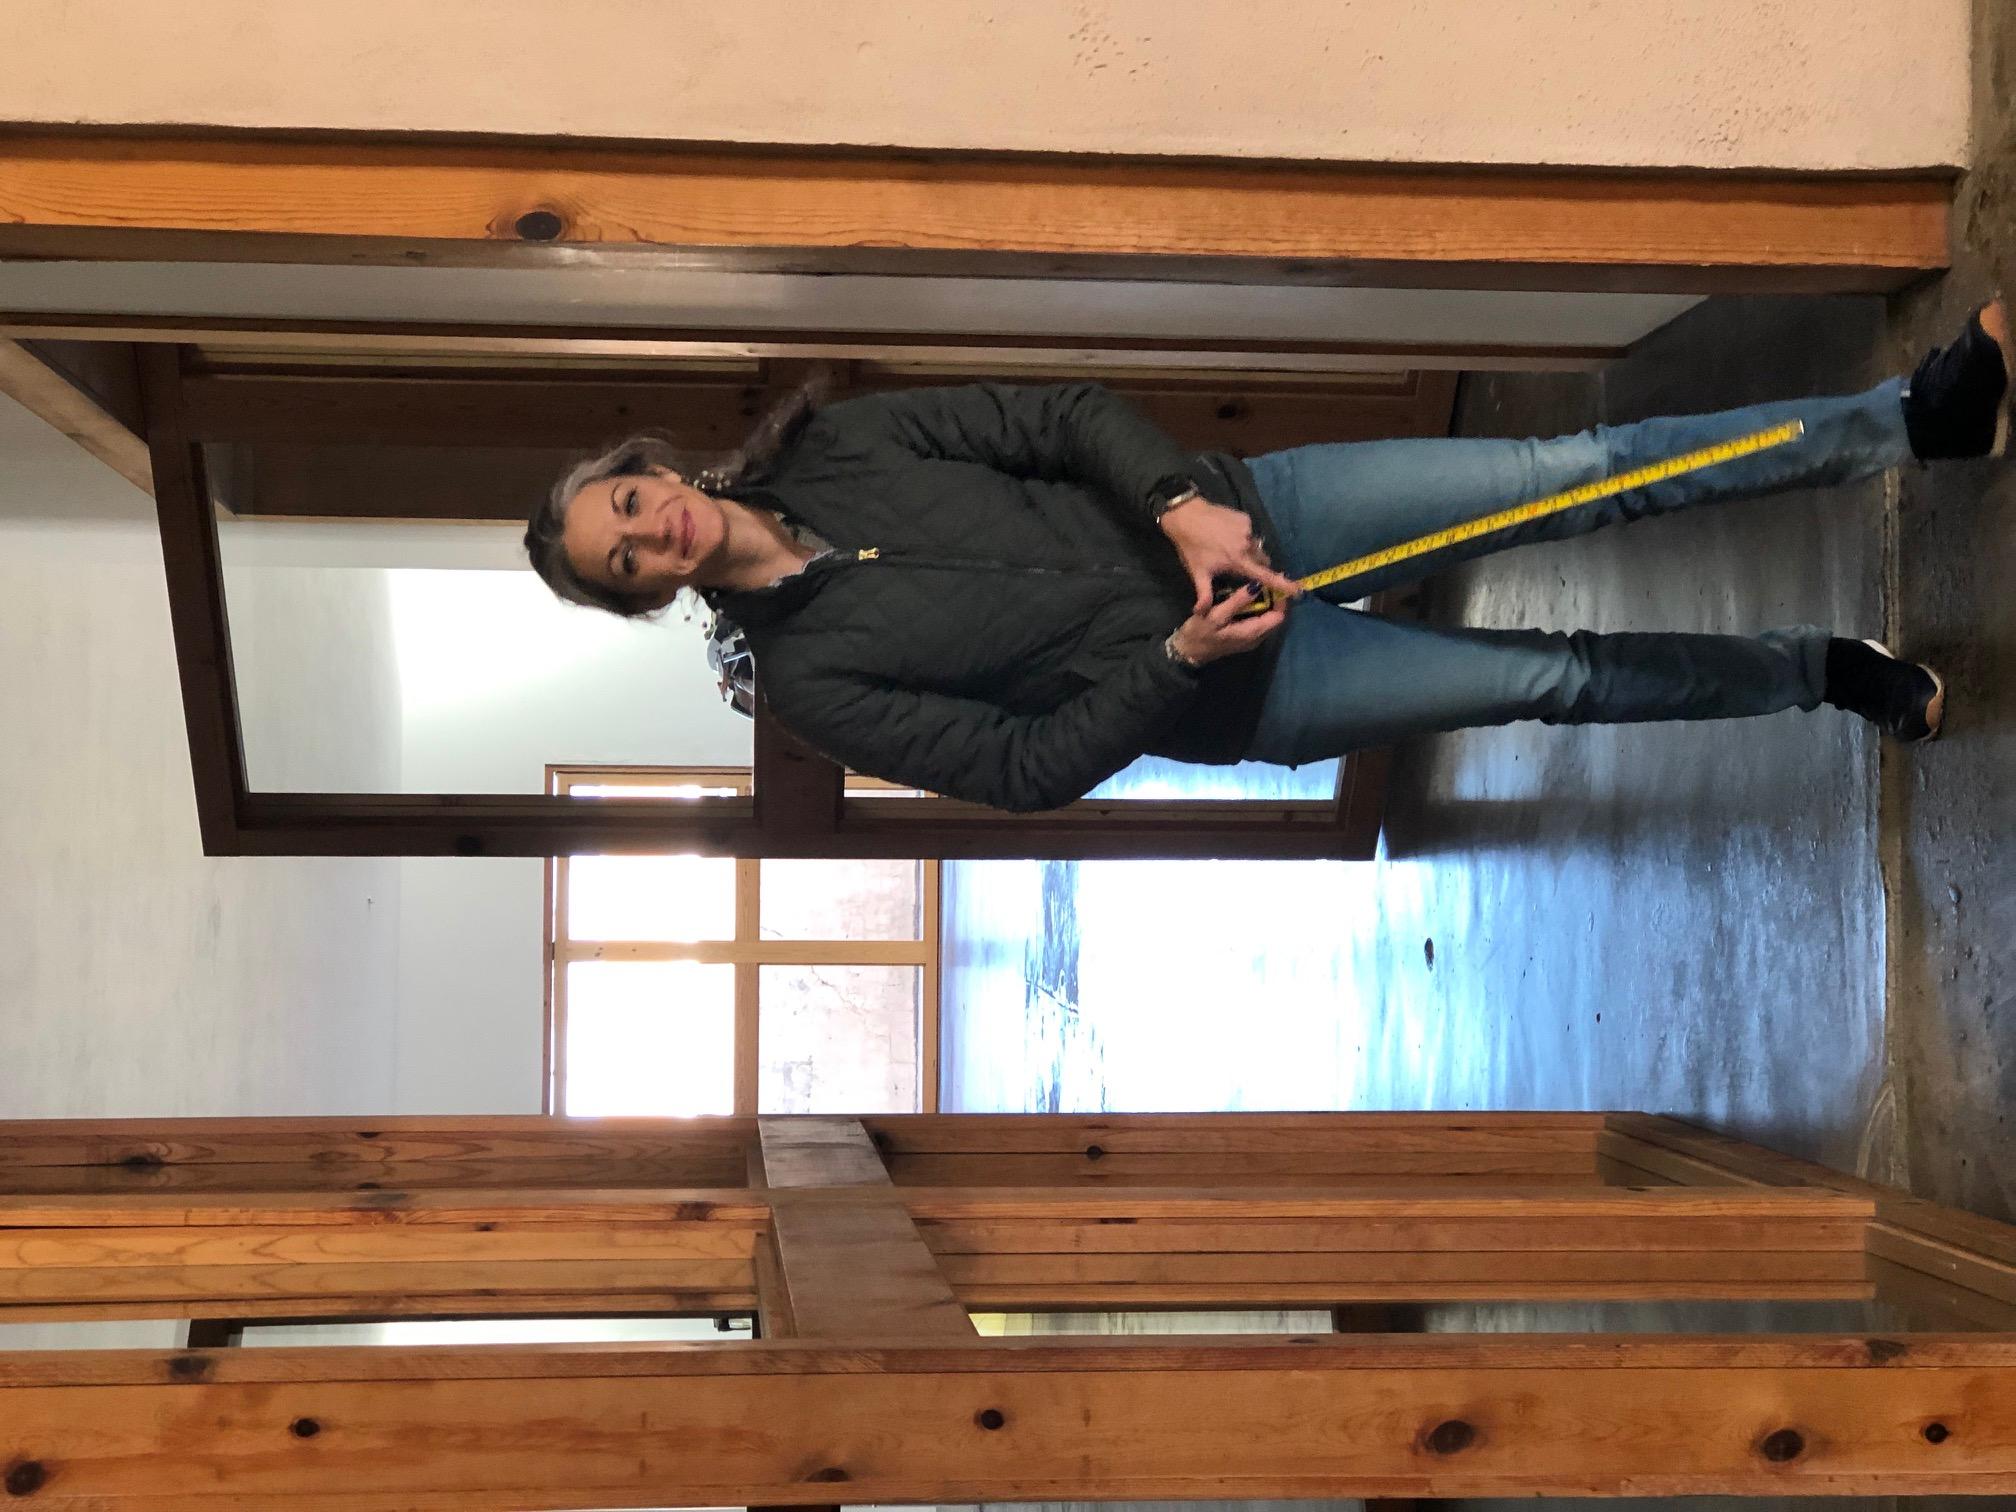 Elaine Andersen standing in doorway, holding a tape measure